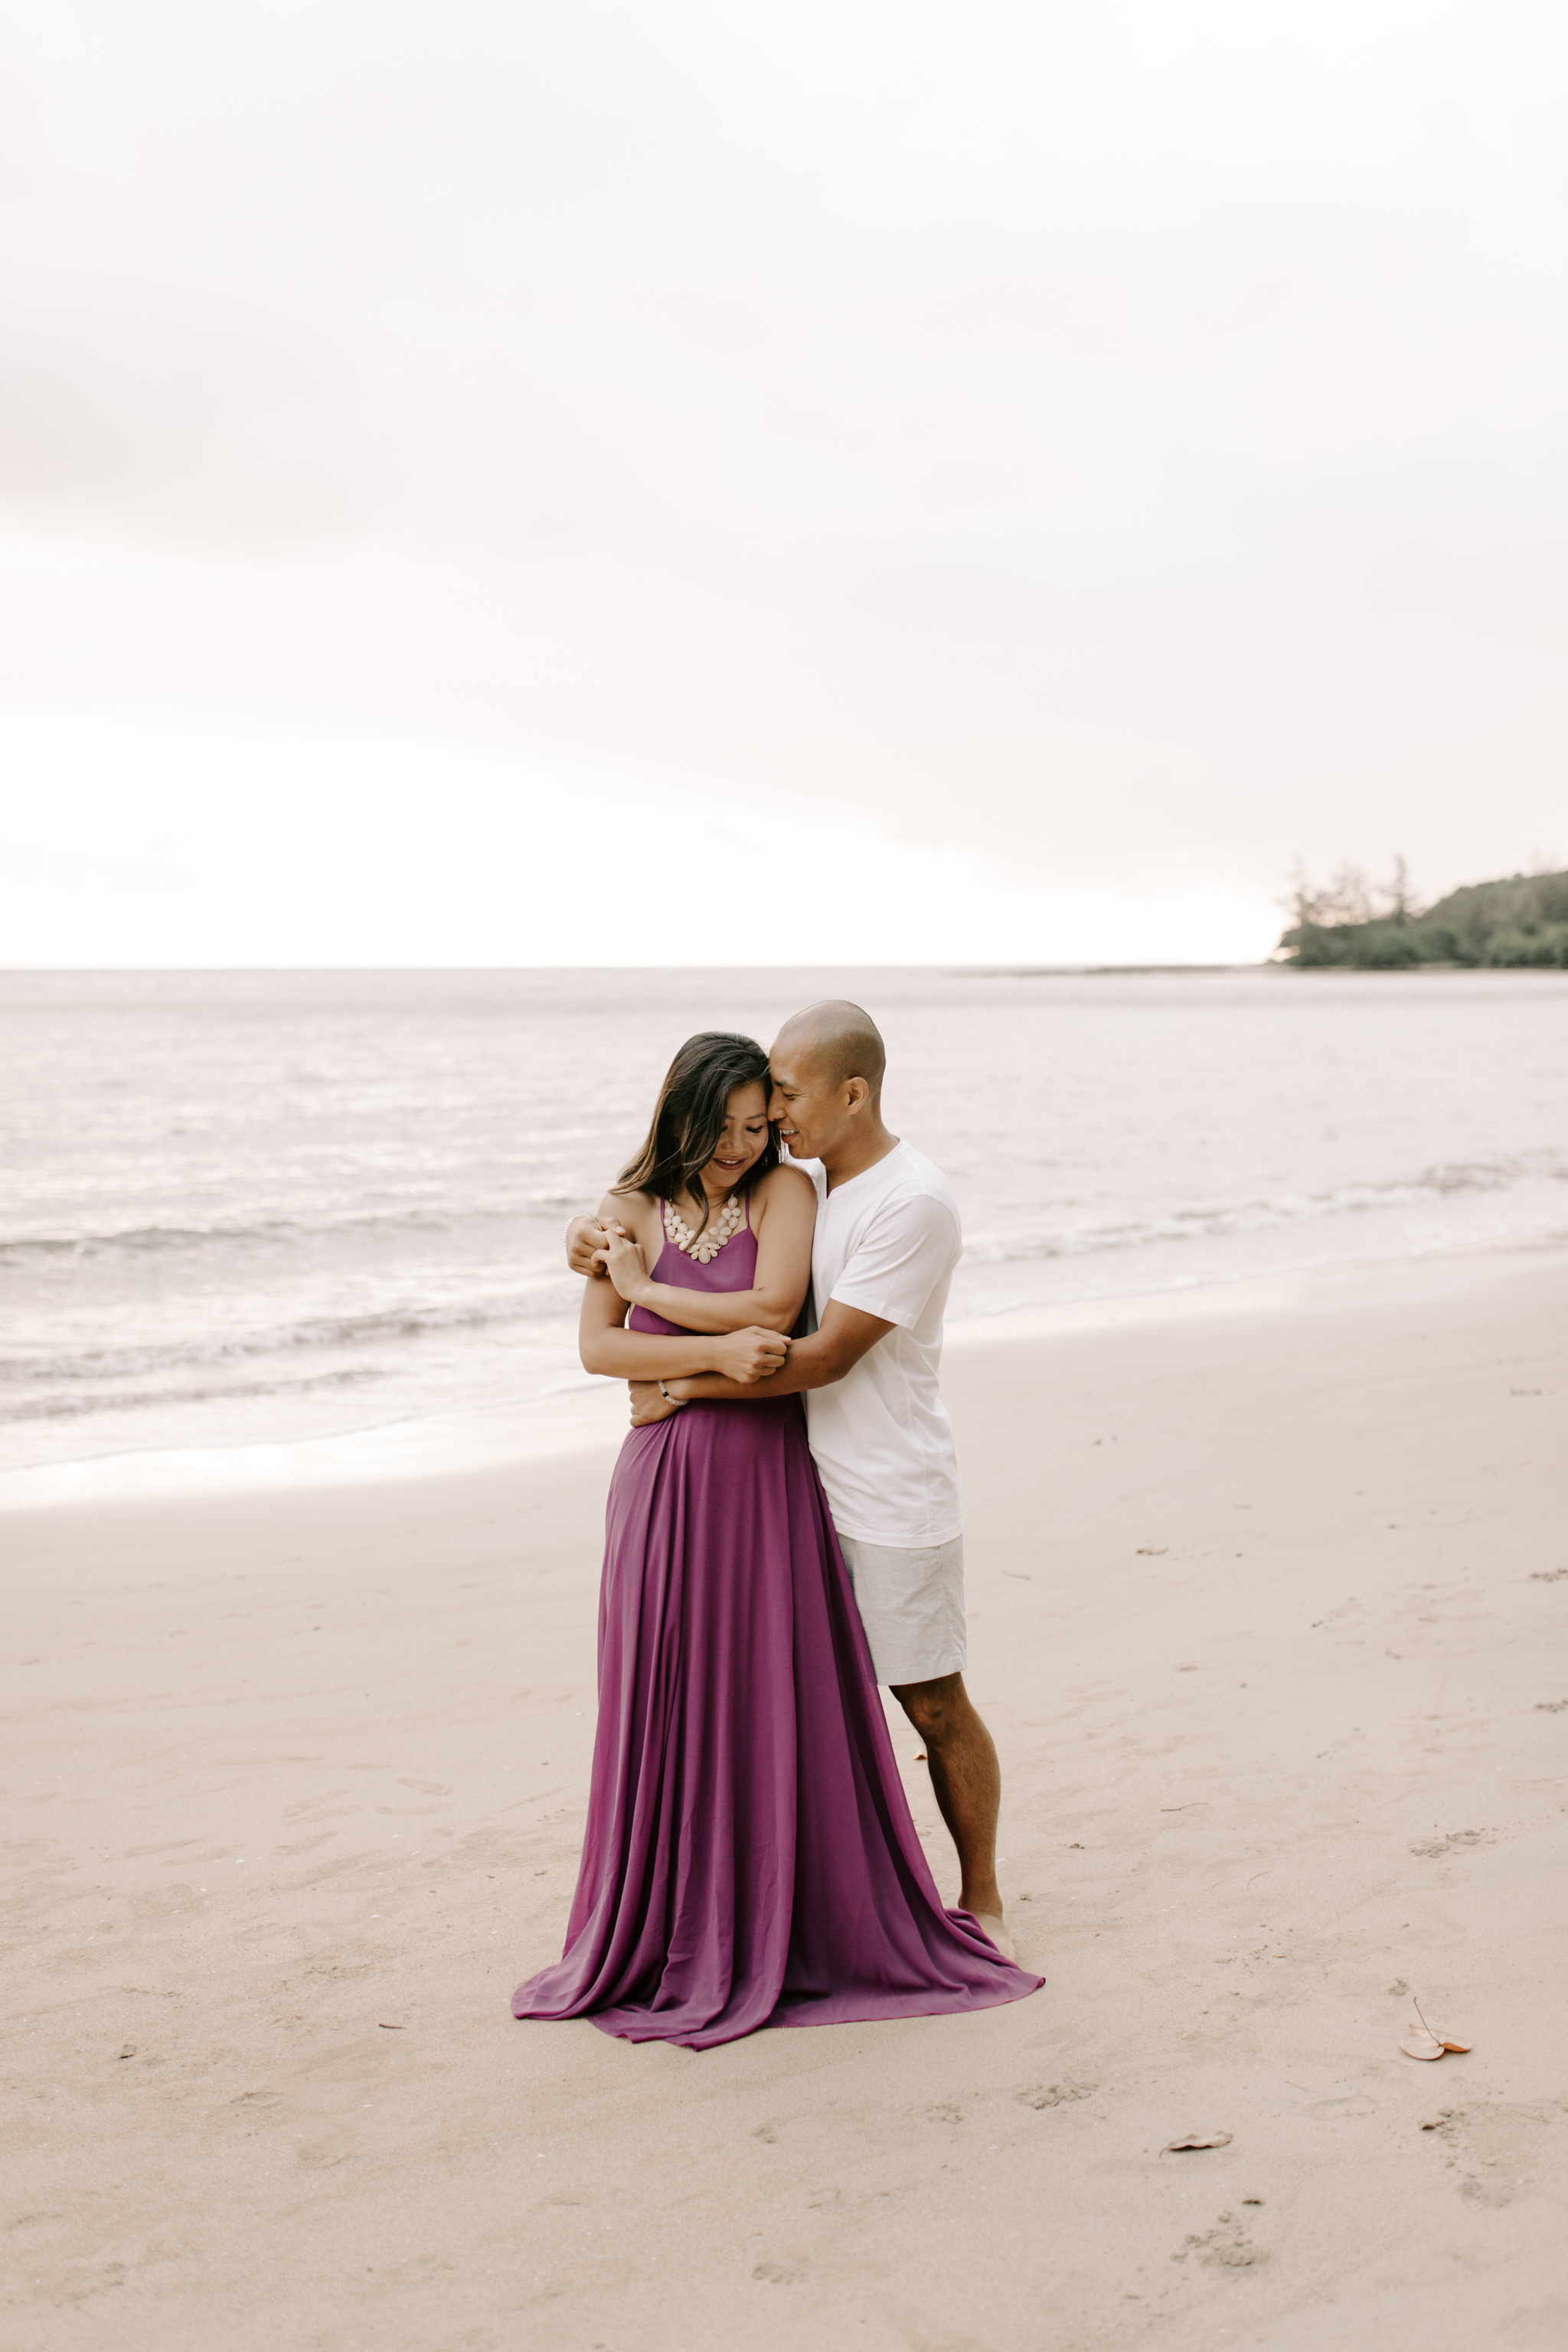 Beautiful Kahana Bay Sunrise Couple Photos By Hawaii Couple Photographer Desiree Leilani